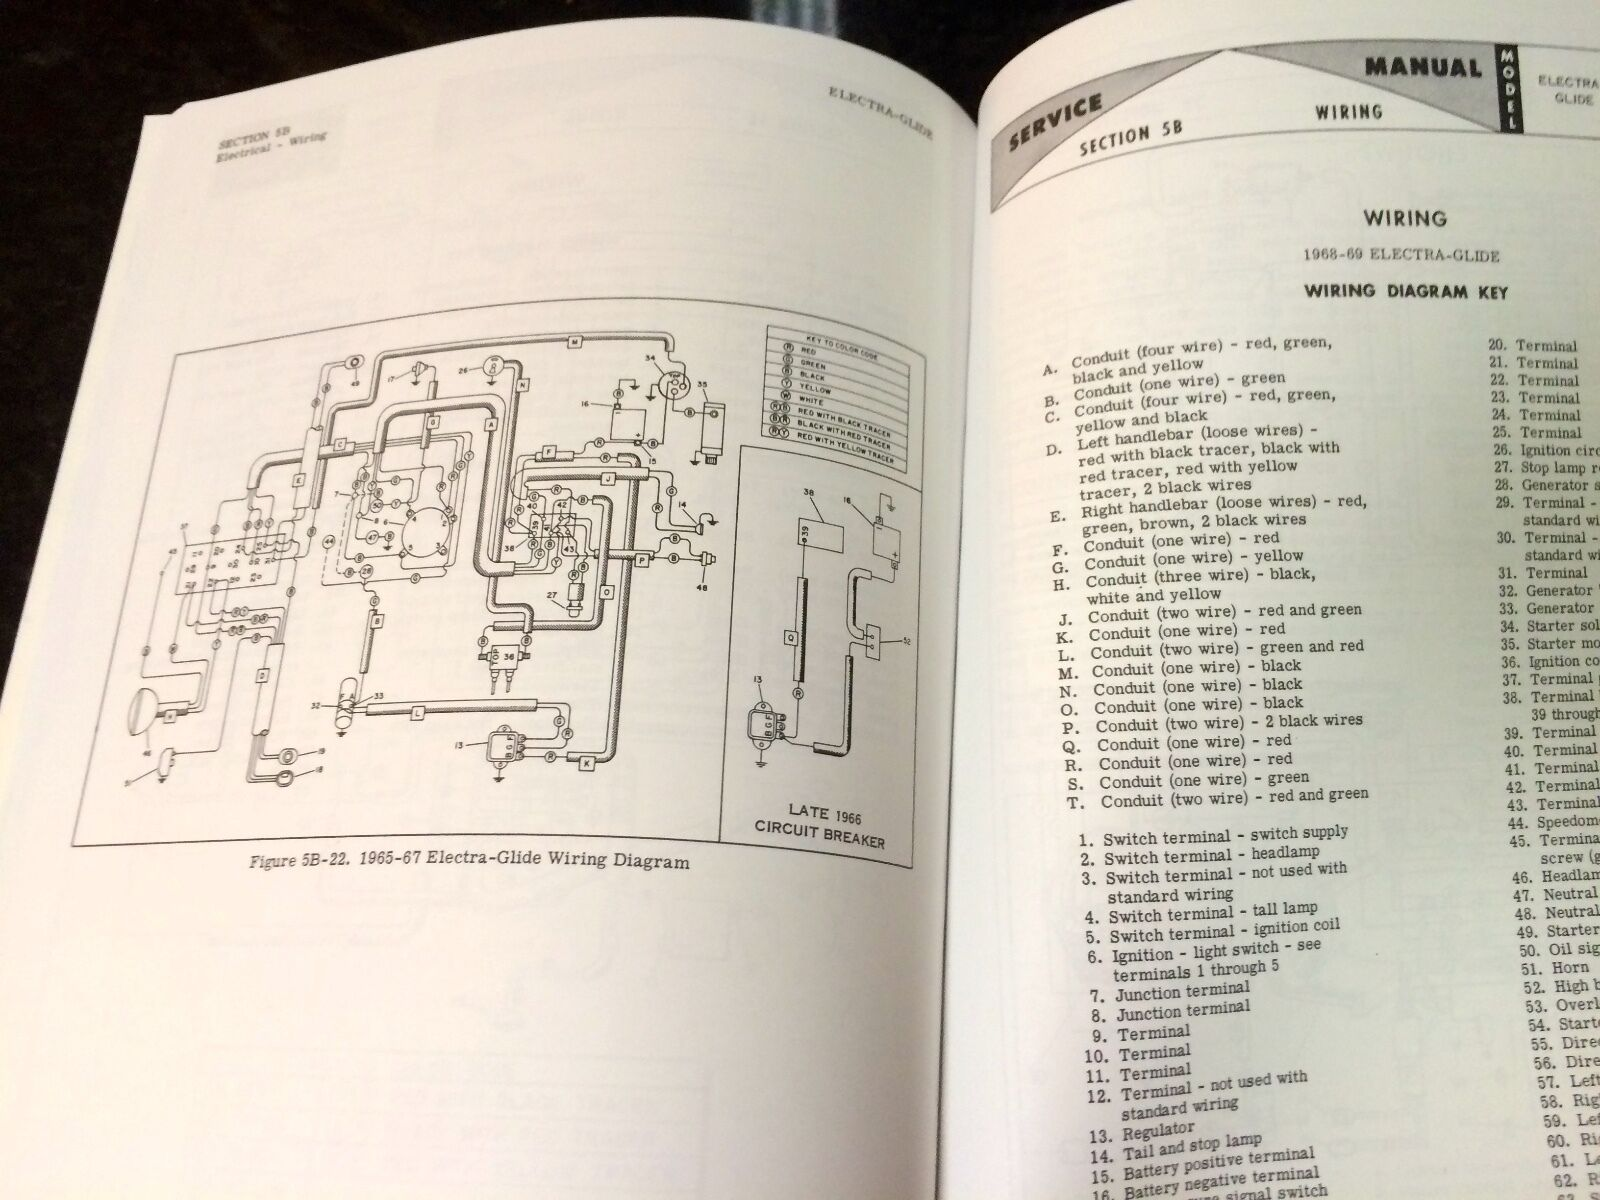 harley fl flh service manual 1959 to 1969 panhead shovelhead electra rh picclick com